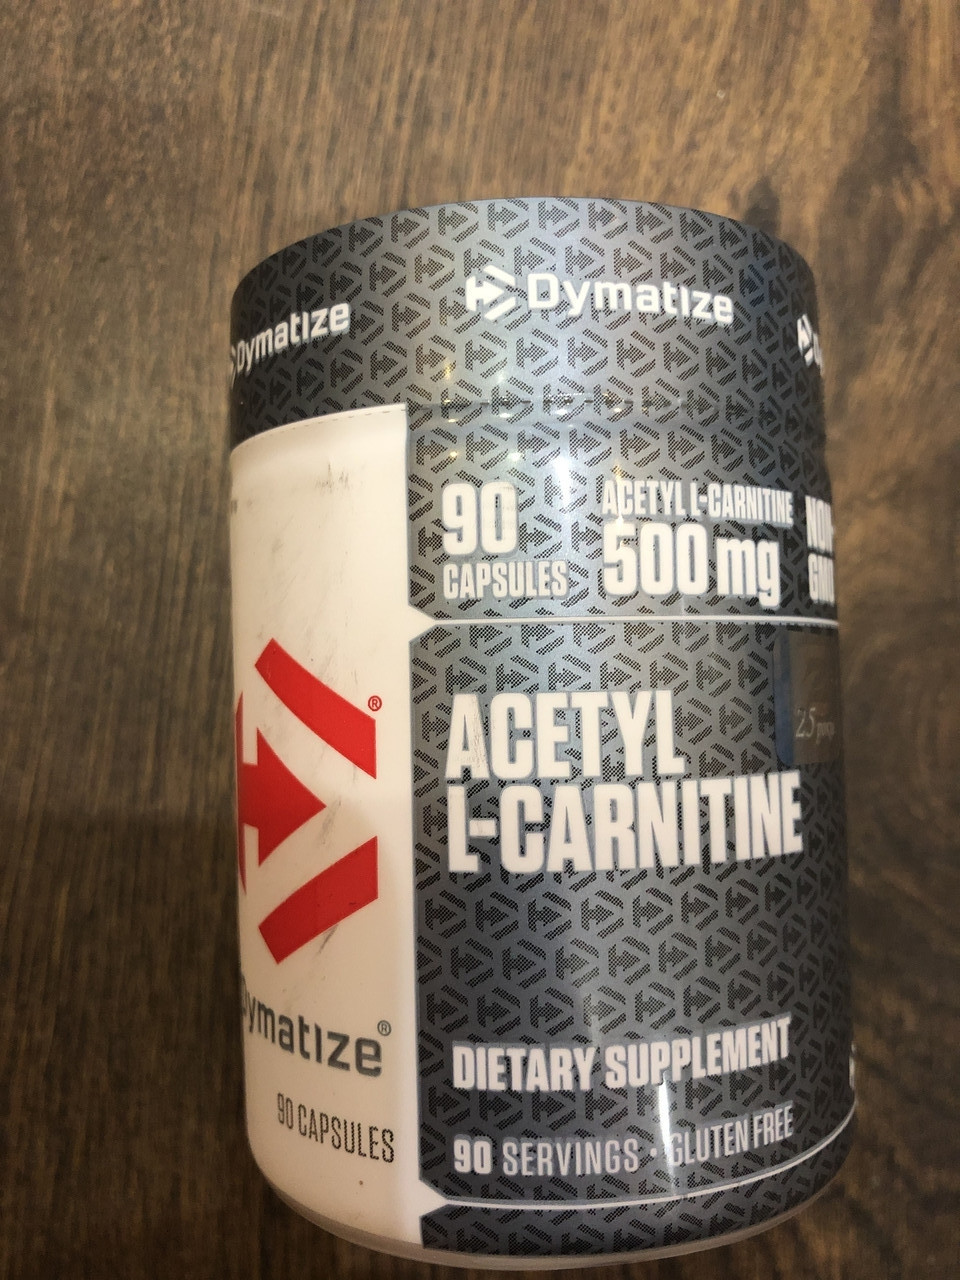 Ацетил l-карнітин, Dymatize Nutrition, Acetyl L-Carnitine, (500mg) caps 90